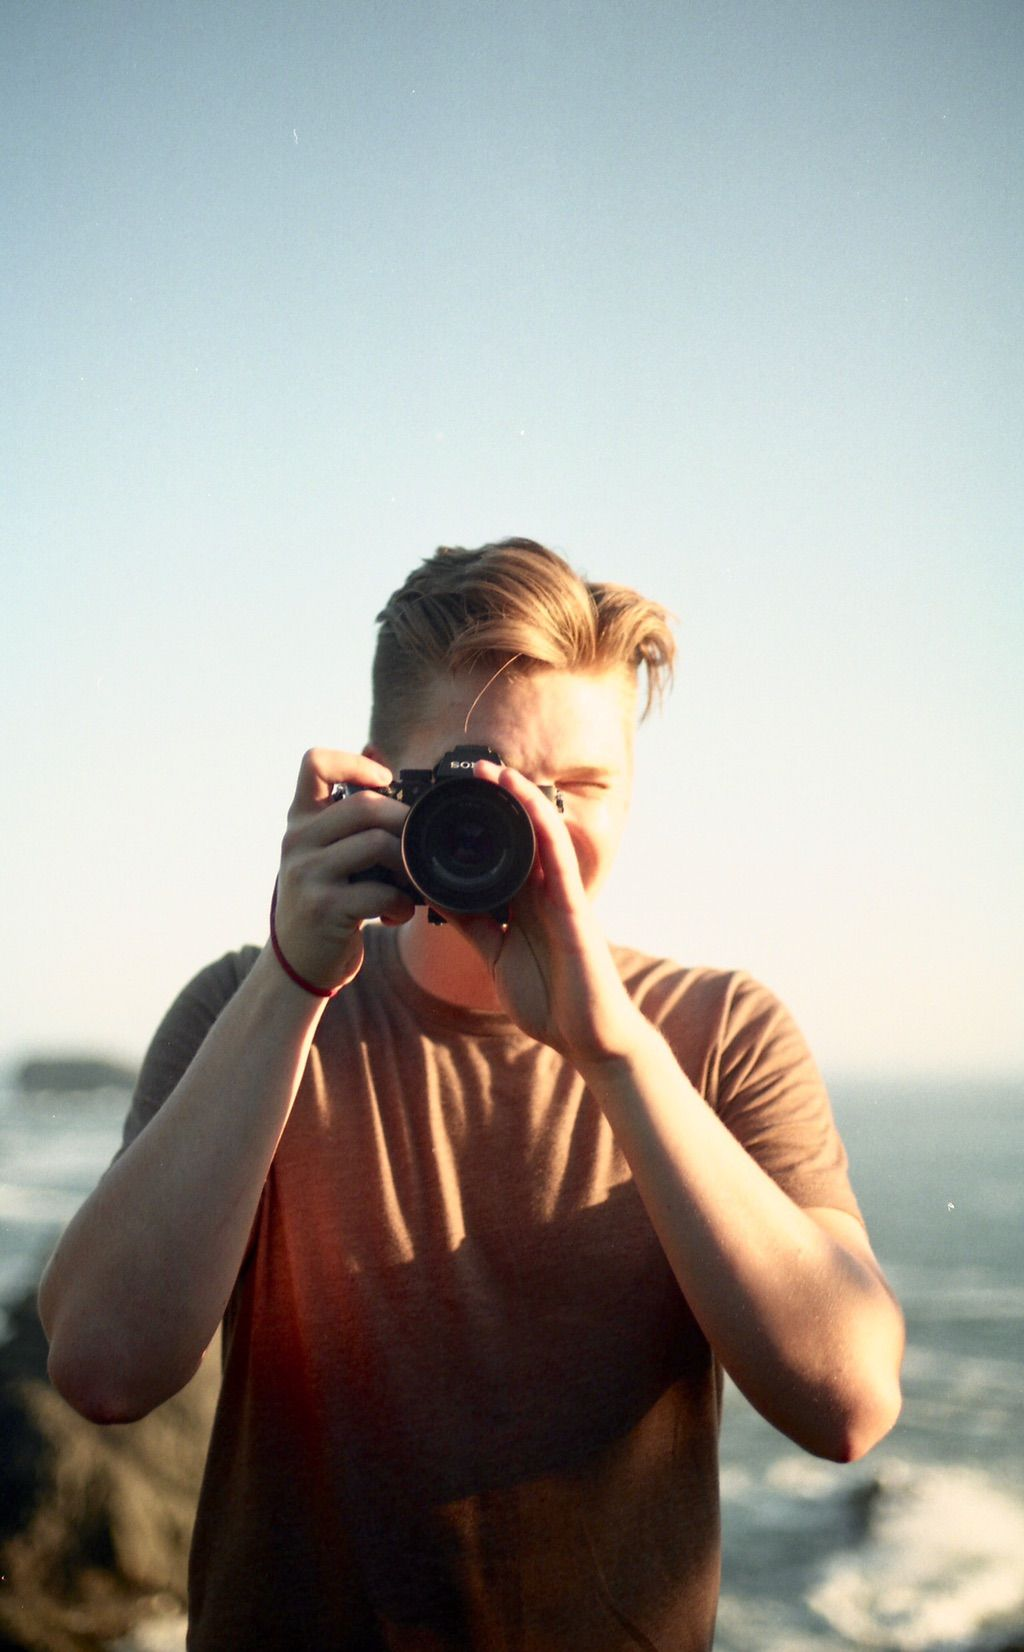 Christopher Janisch Photography